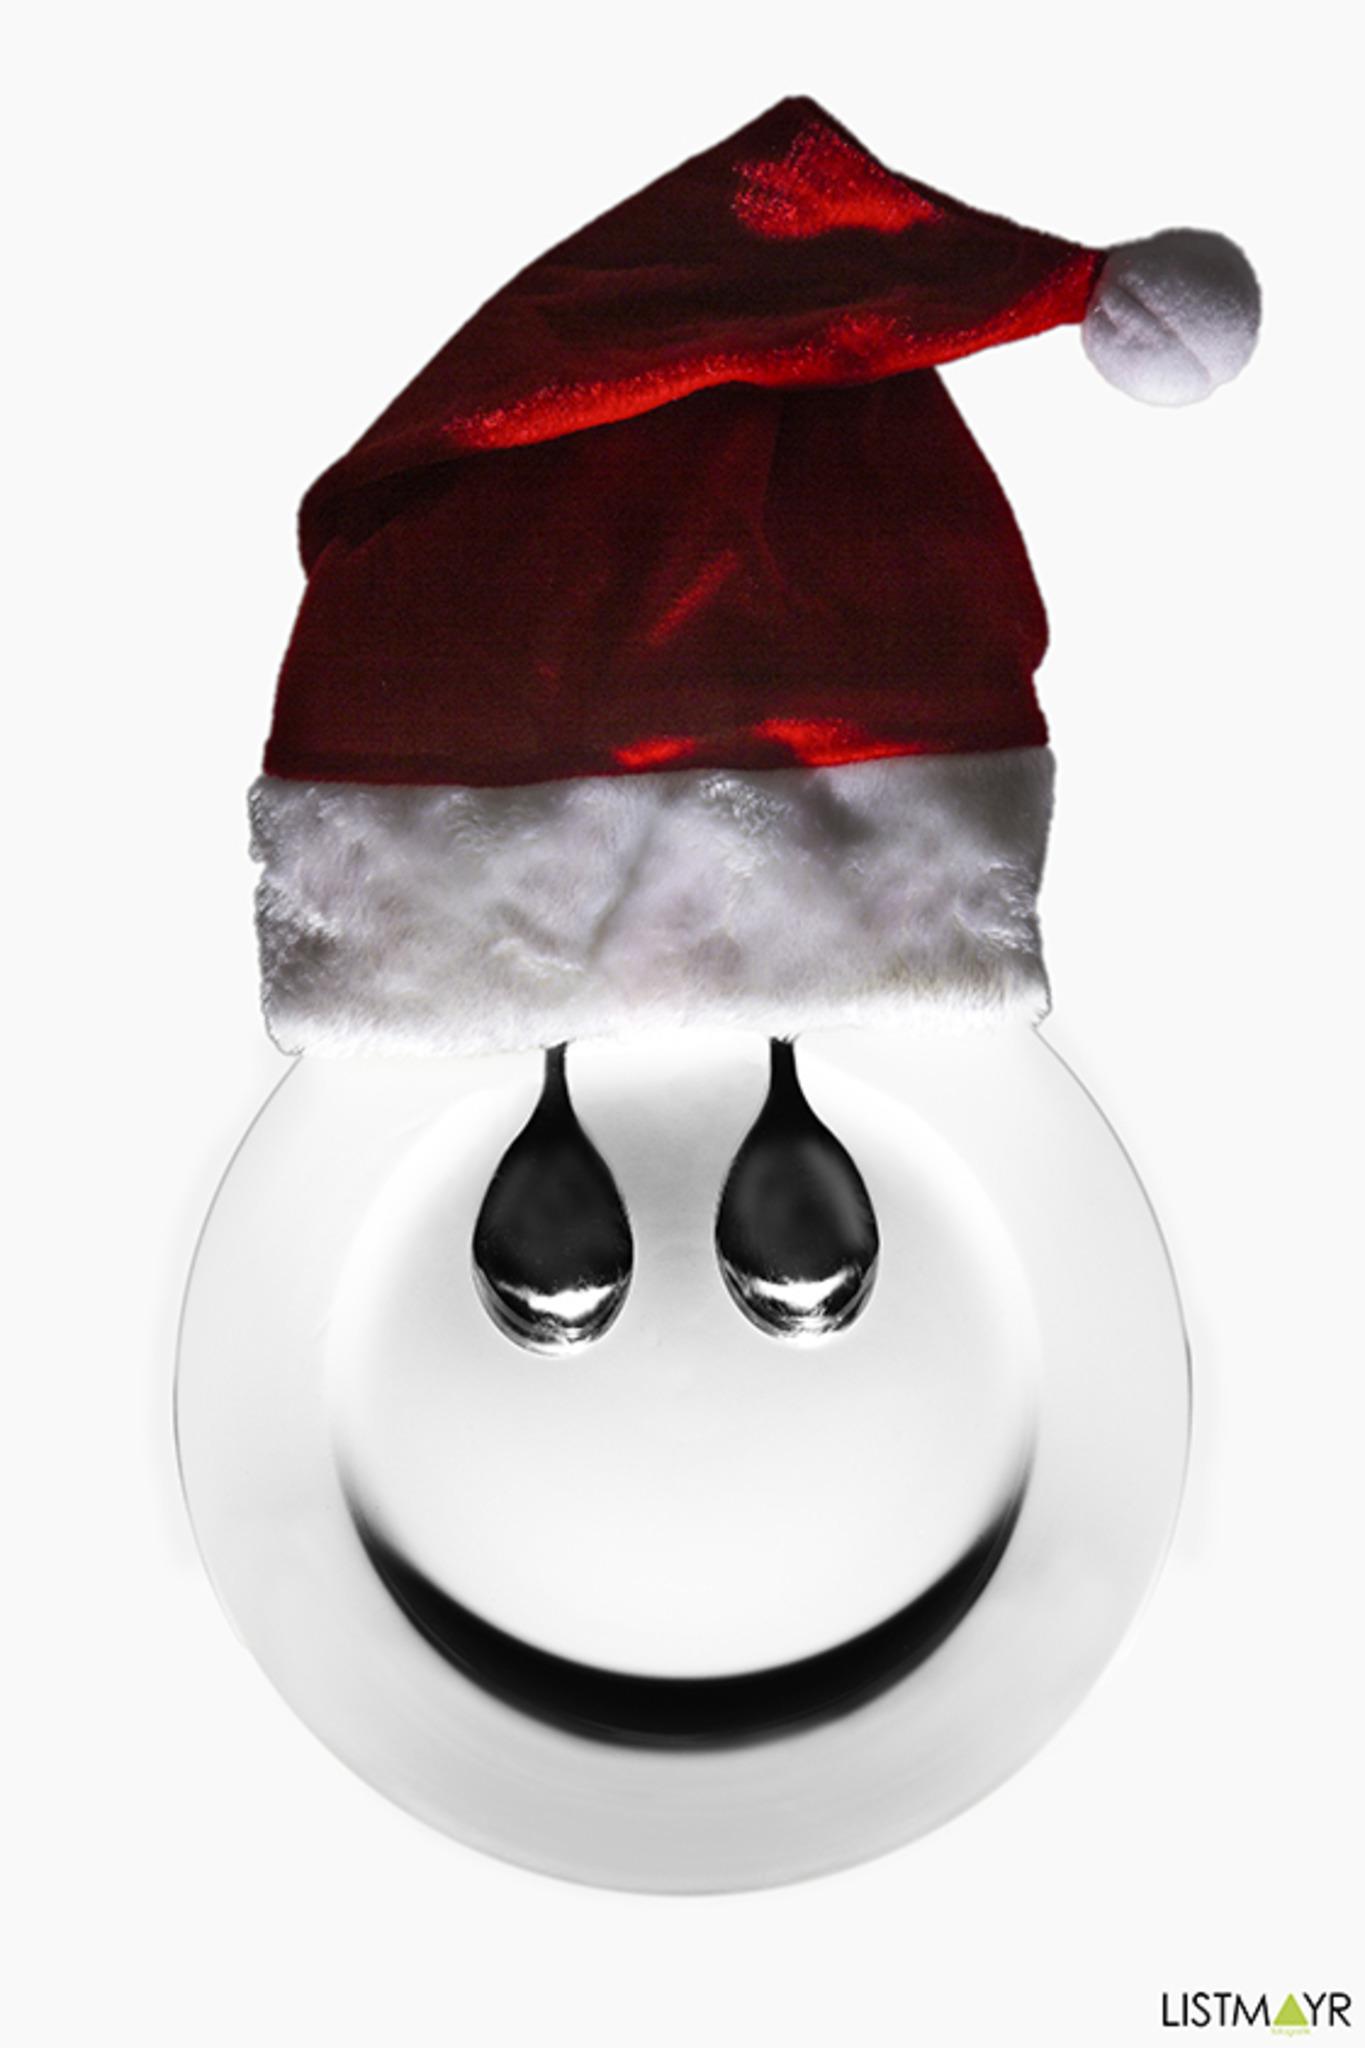 Wünsch Euch Allen Frohe Weihnachten.Wünsche Euch Allen Frohe Weihnachten Baden